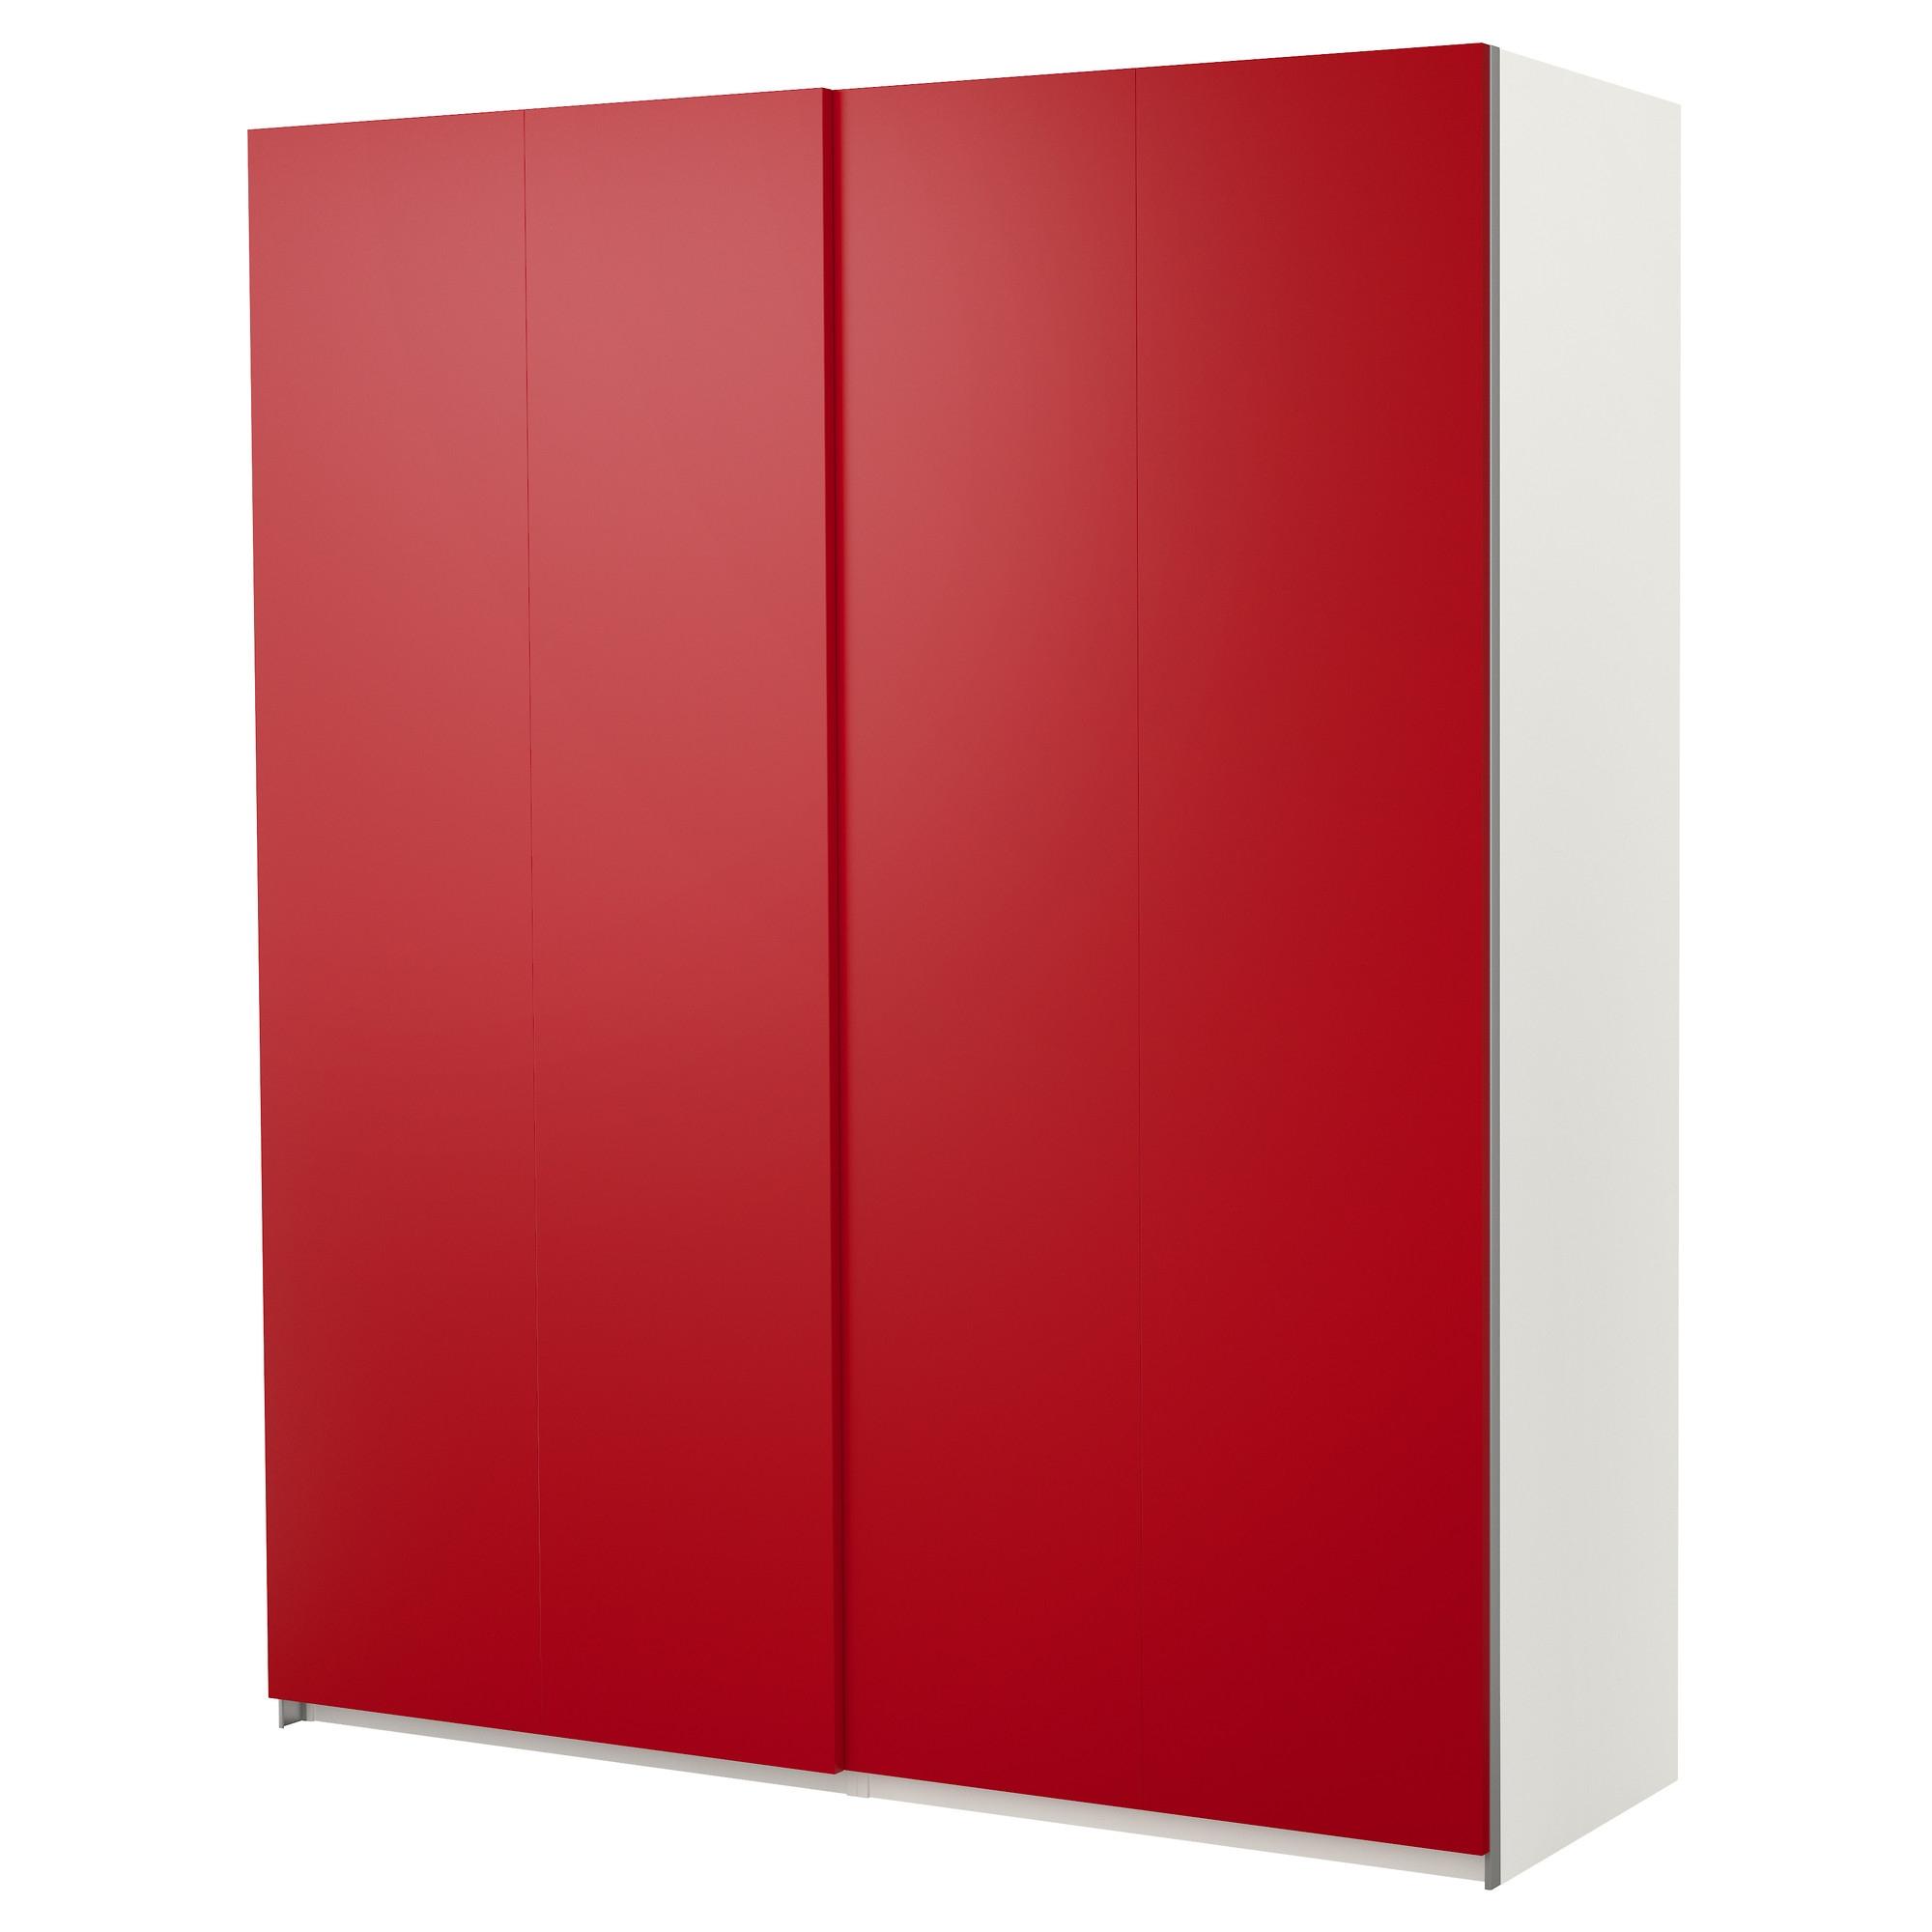 Pax armario con 4 puertas - Ikea armarios modulares ...